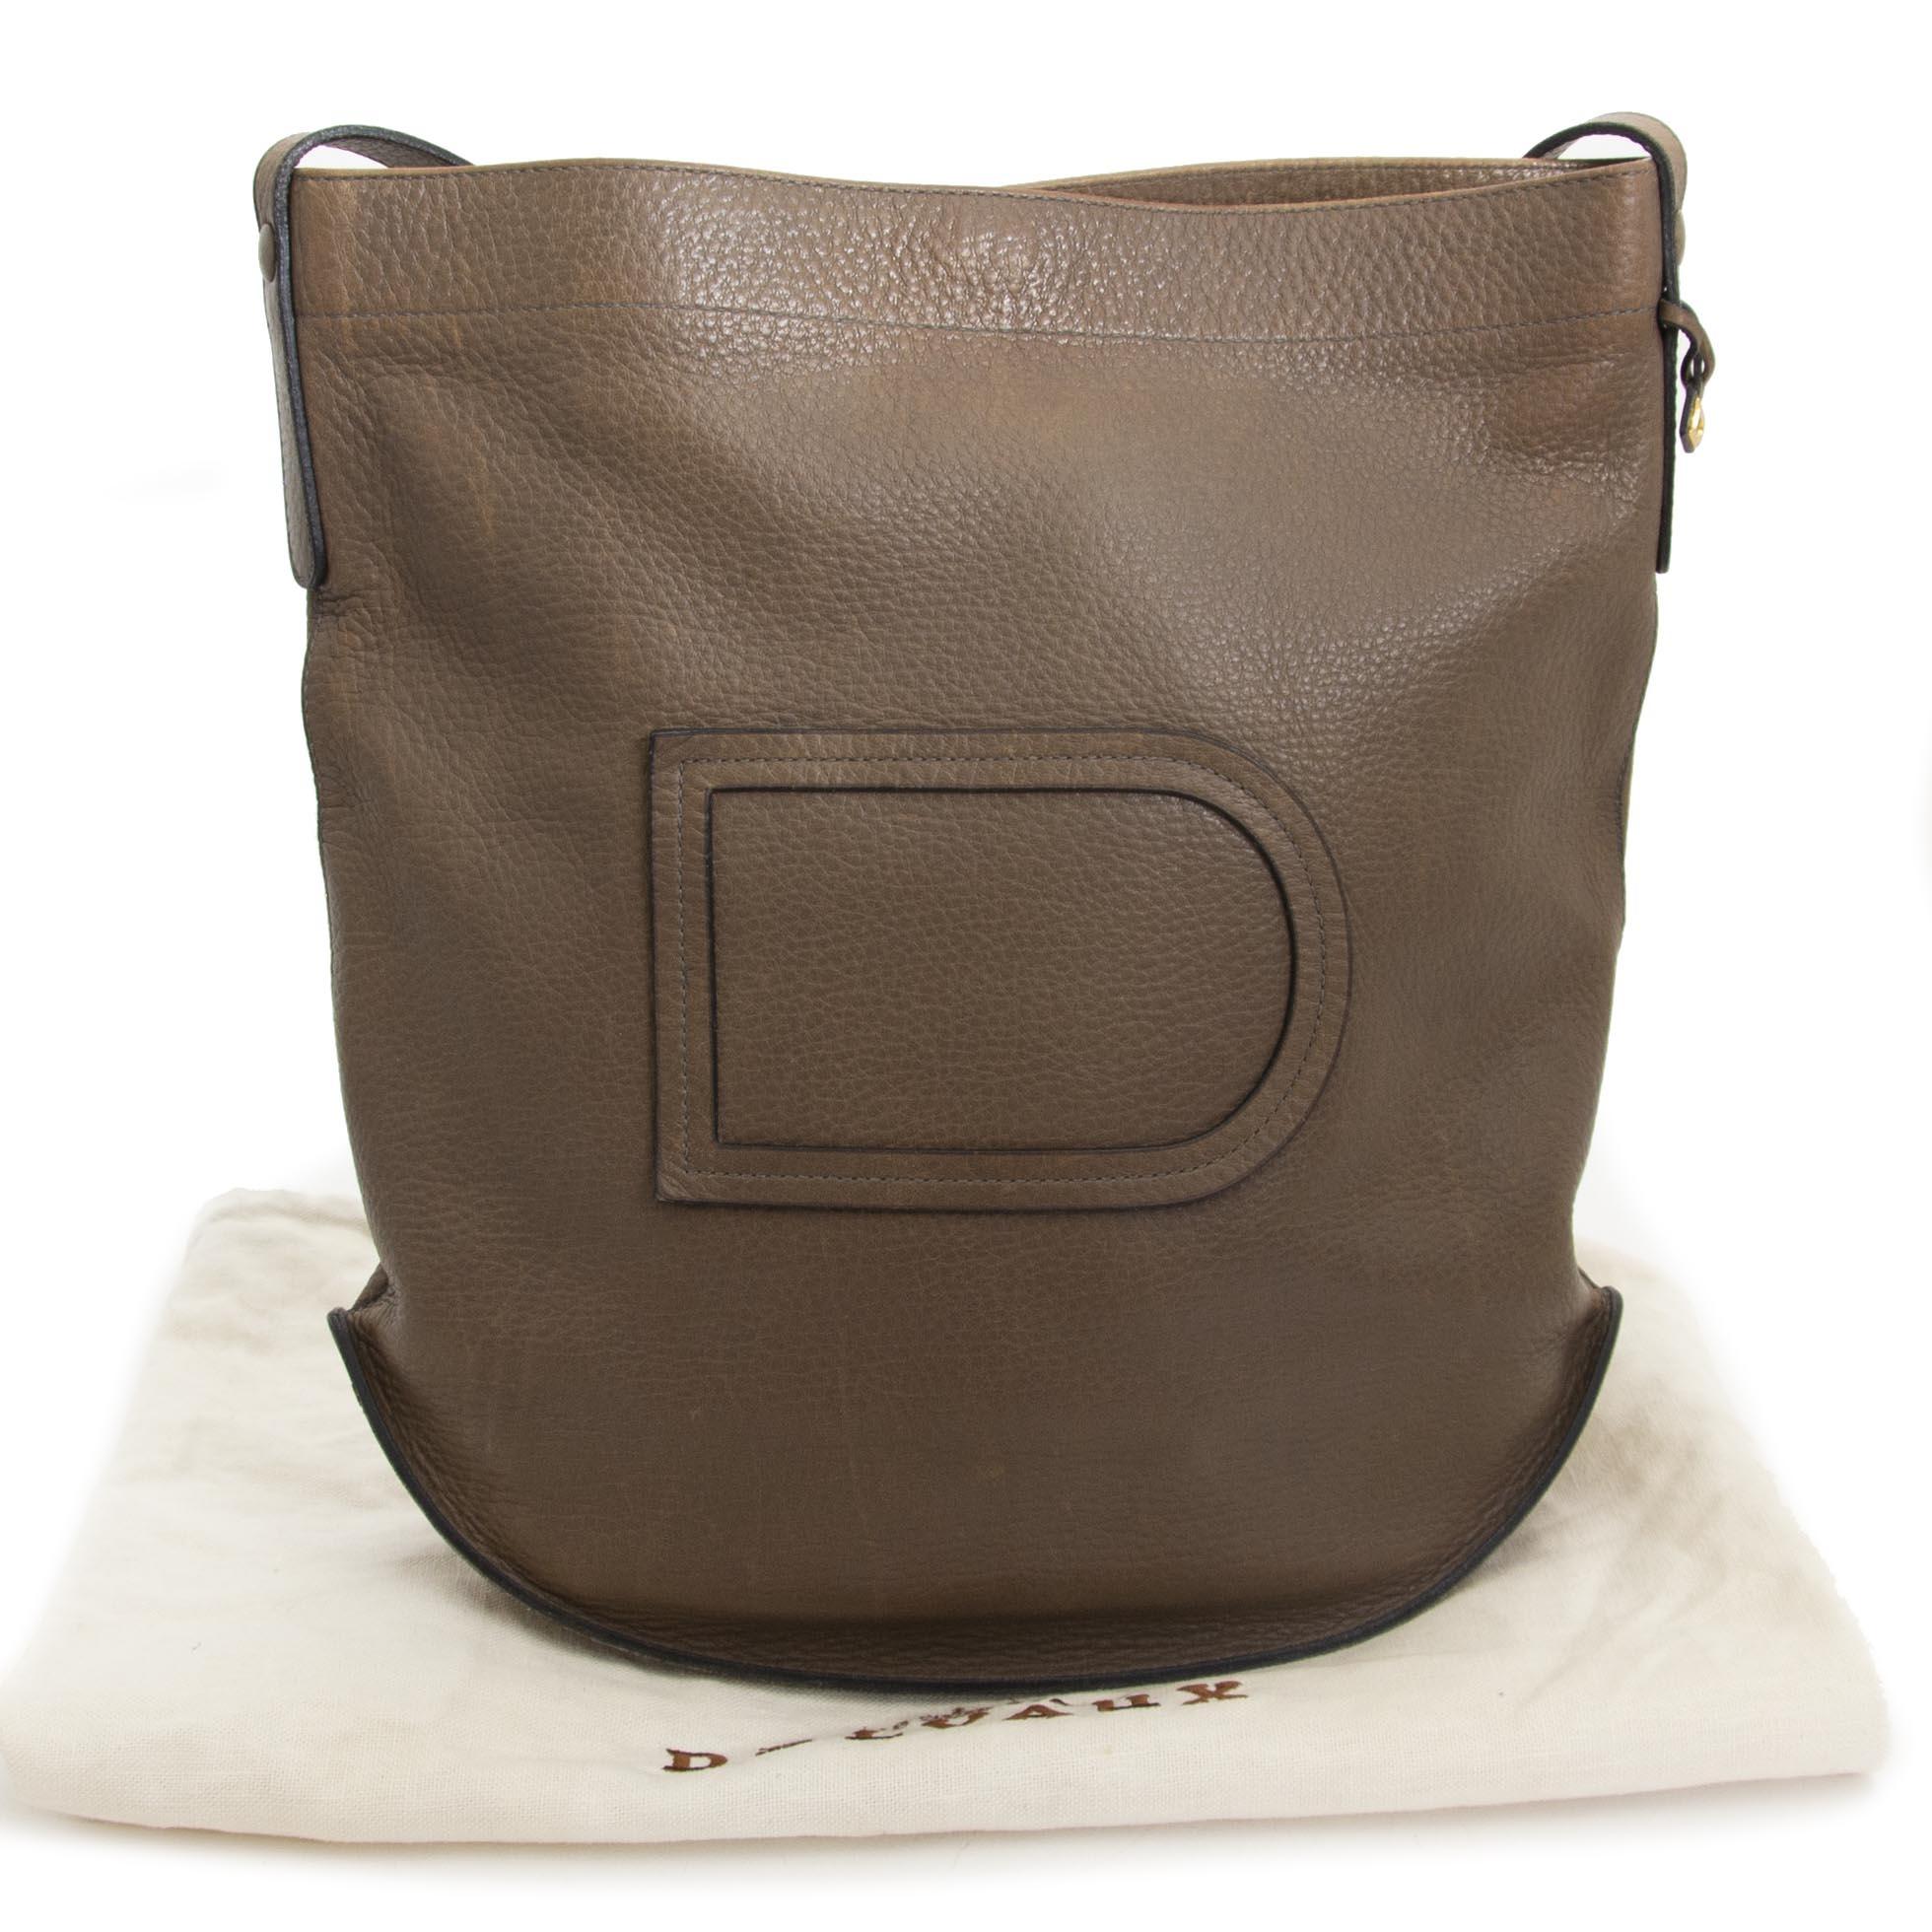 skip the waiting list shop safe online you secondhand Delvaux Taupe Le Pin Shoulder BAG